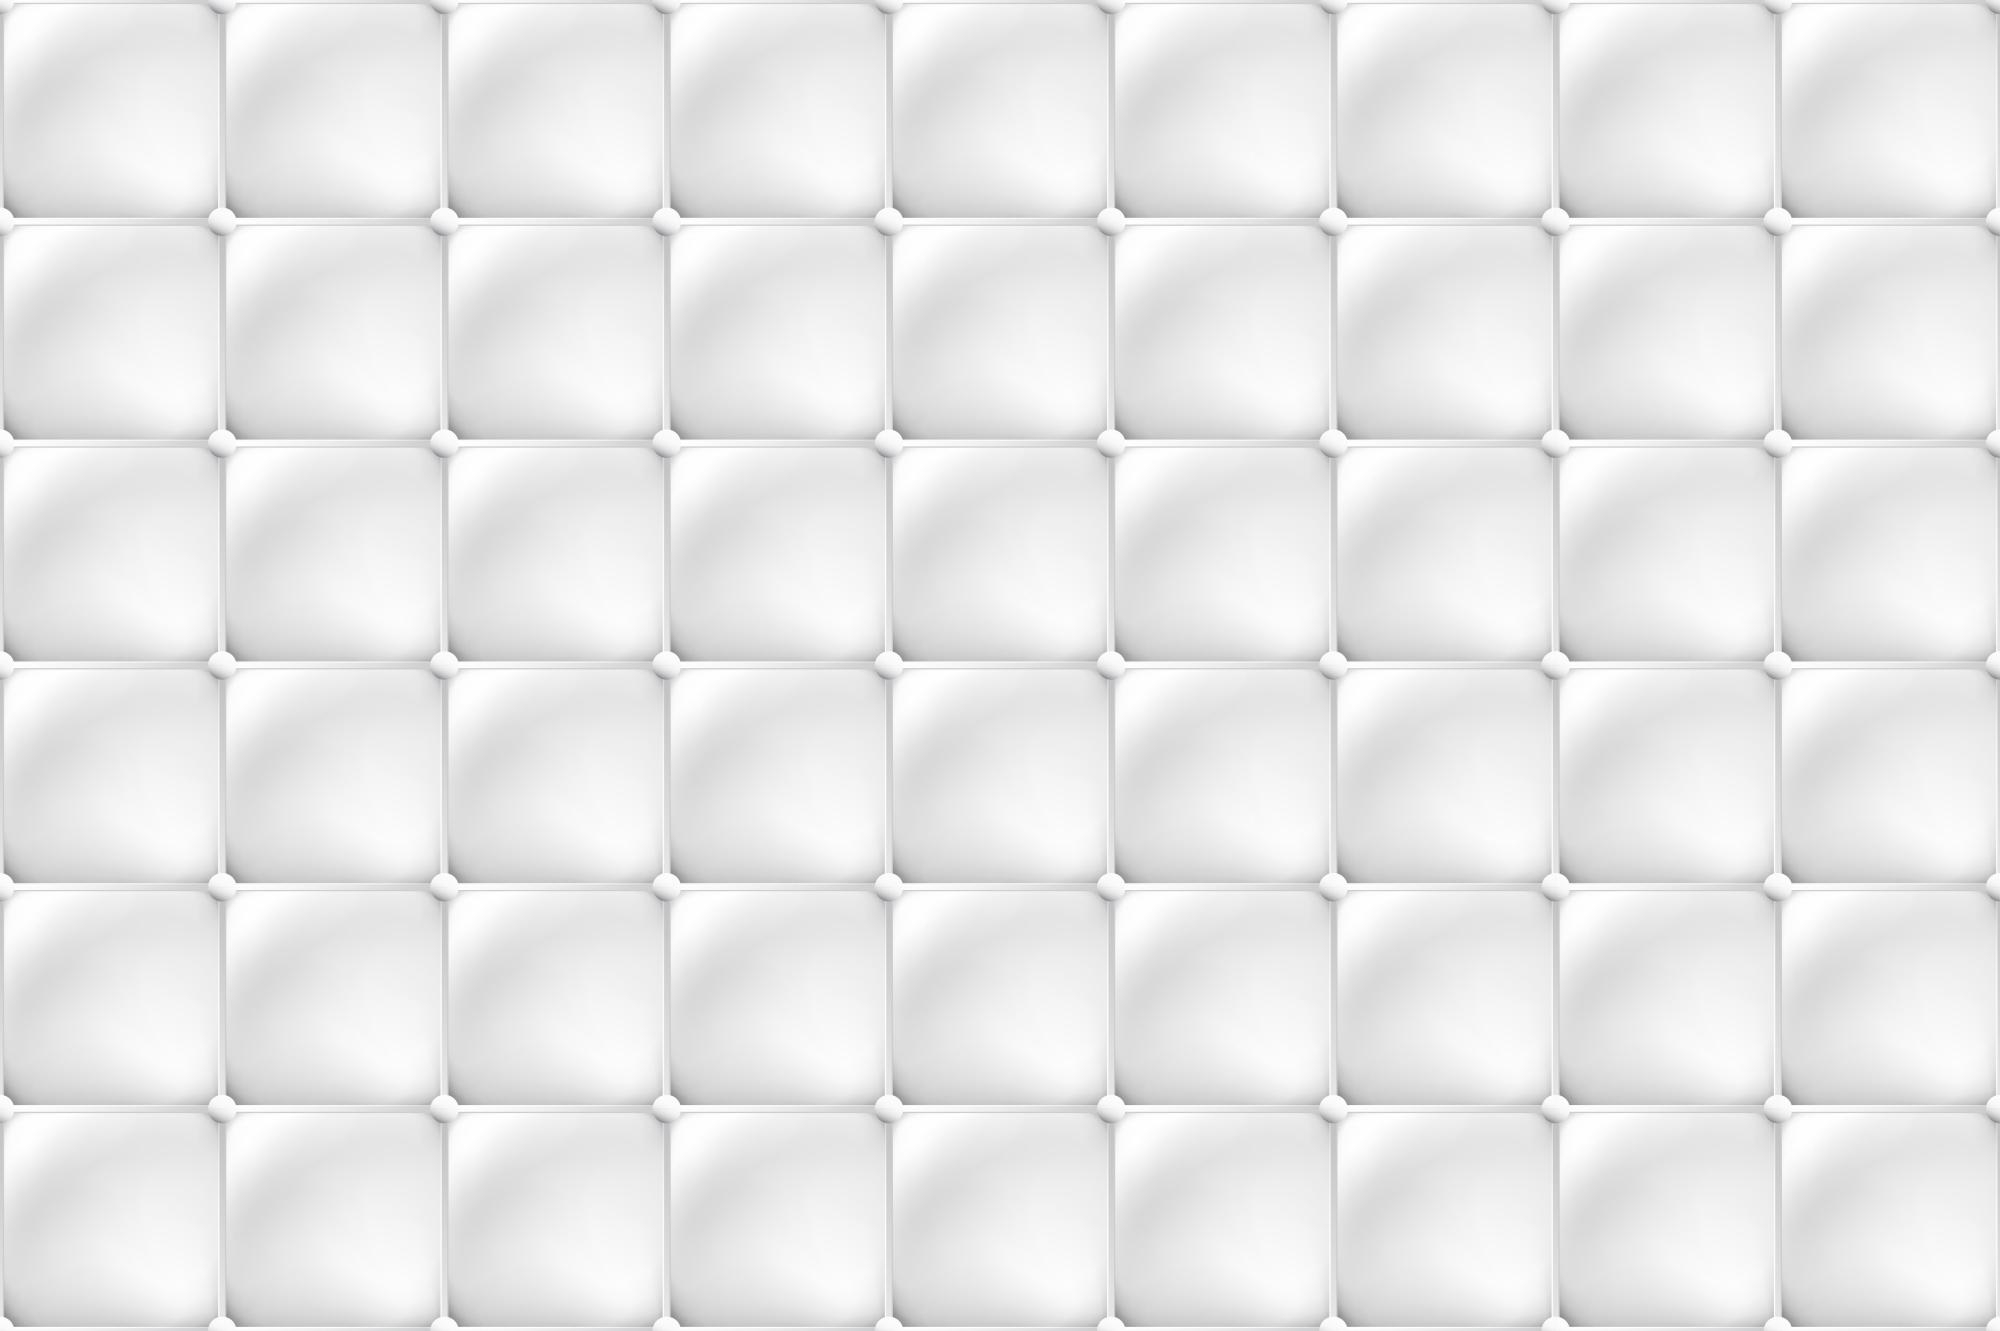 White soft textures - seamless. example image 3